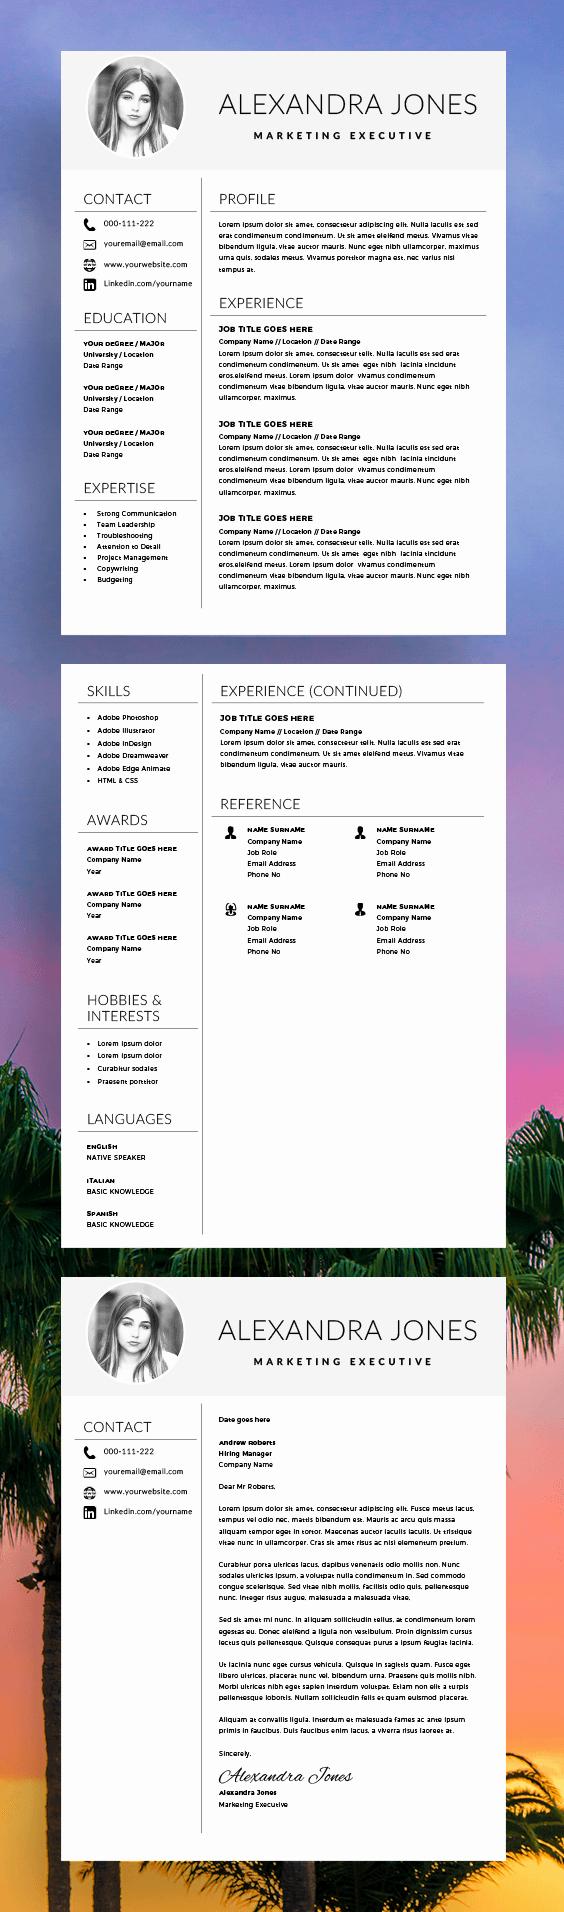 Medical Cv Template Word New Nurse Resume Template Medical Cv Cv Template Cover